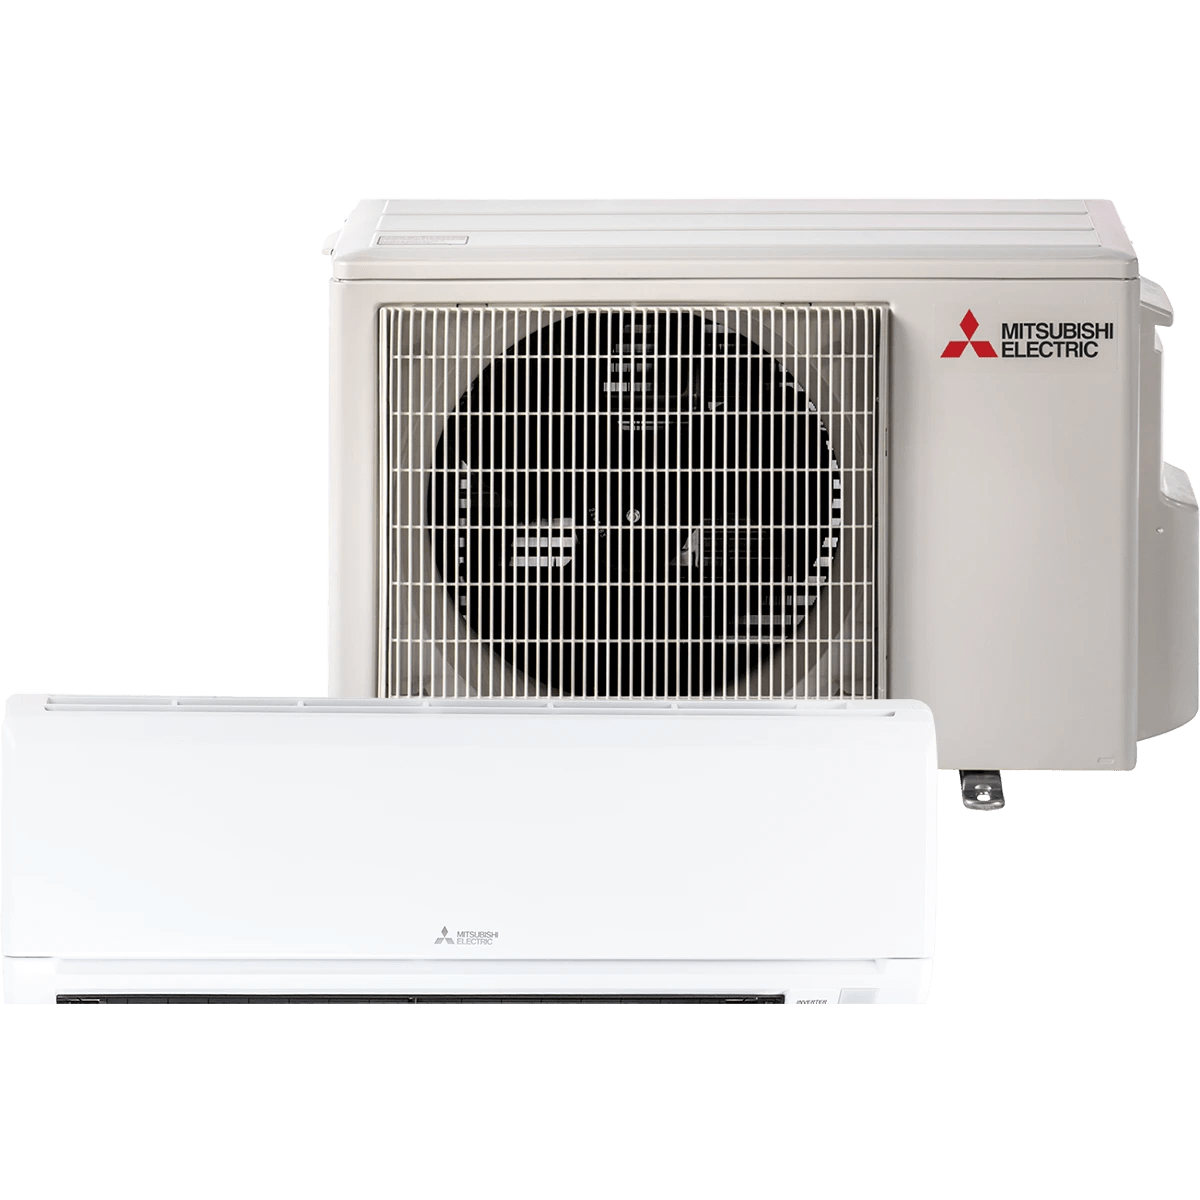 hight resolution of mitsubishi mz gl12na 12 000 btu mini split air conditioner with heat